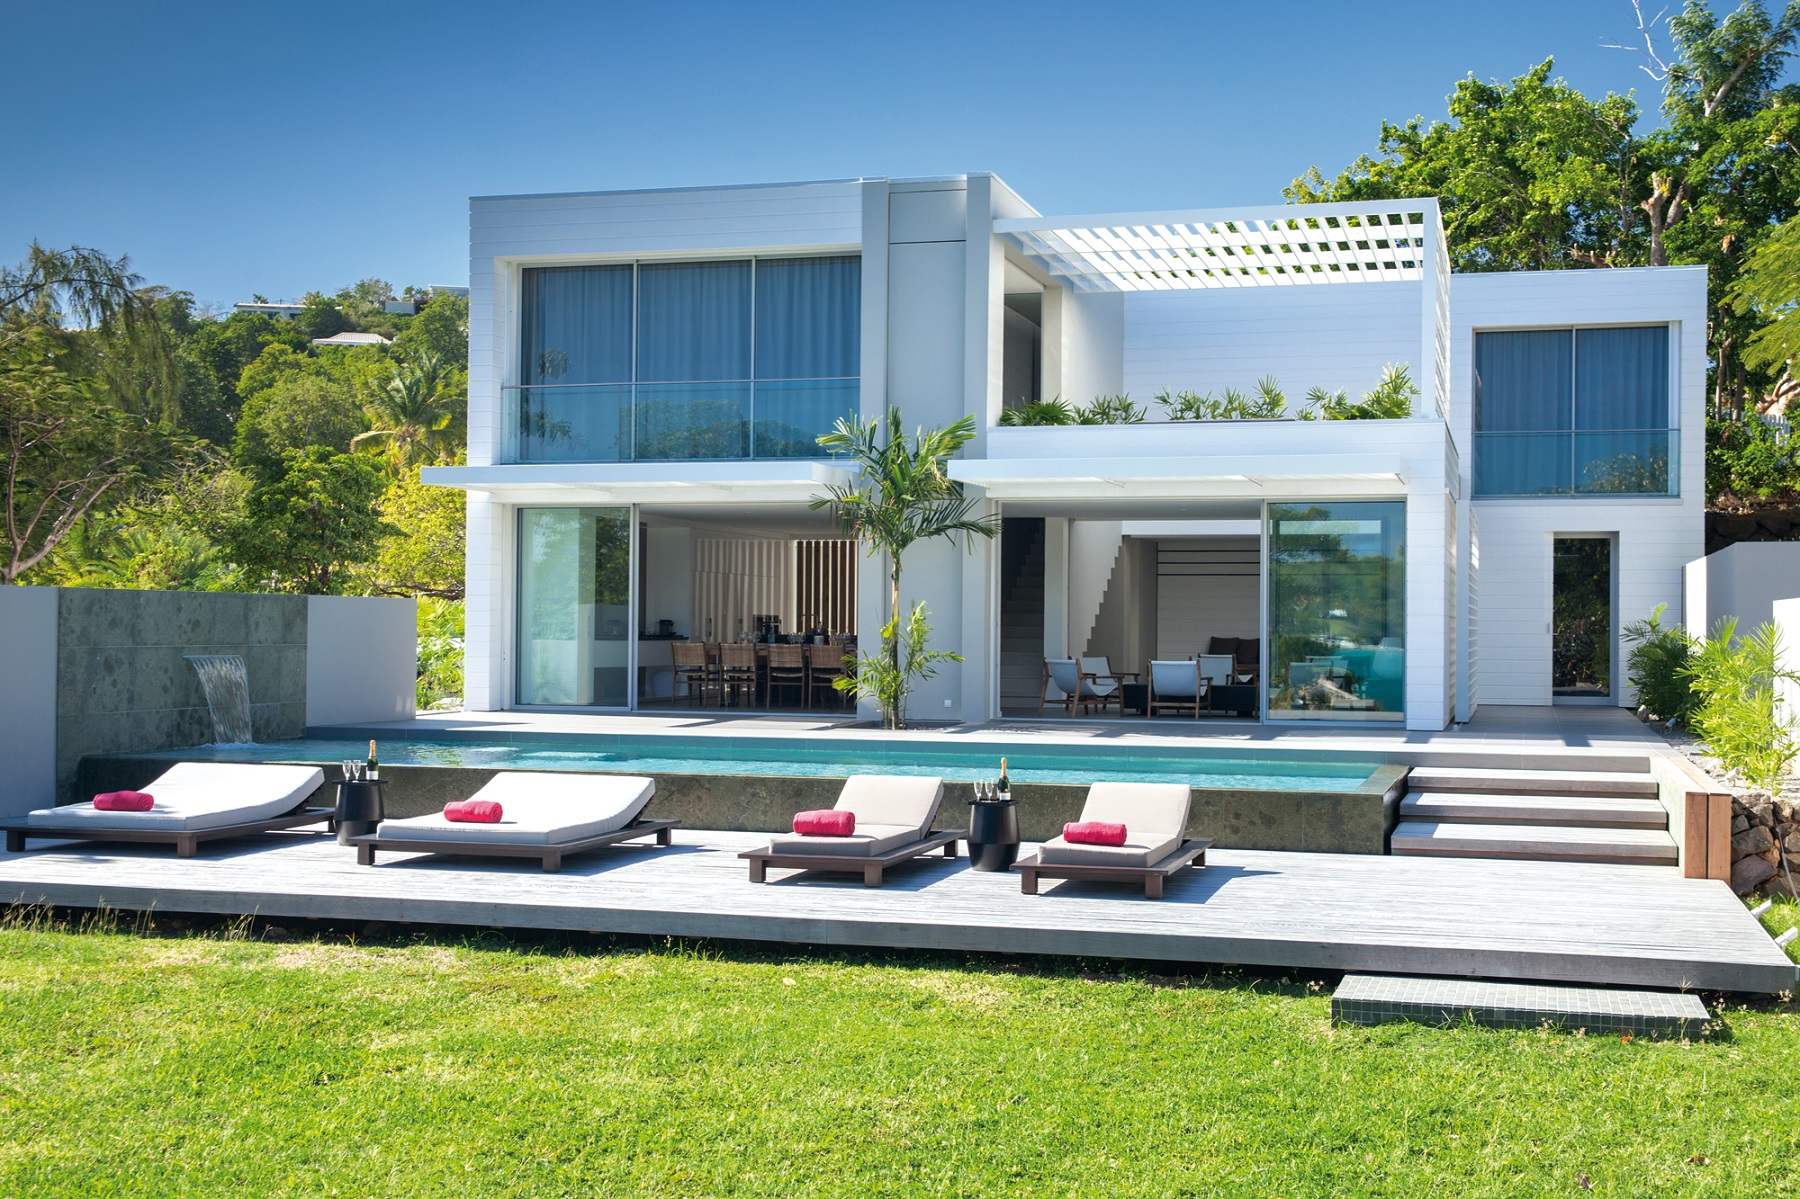 villa de luxe martinique. Black Bedroom Furniture Sets. Home Design Ideas